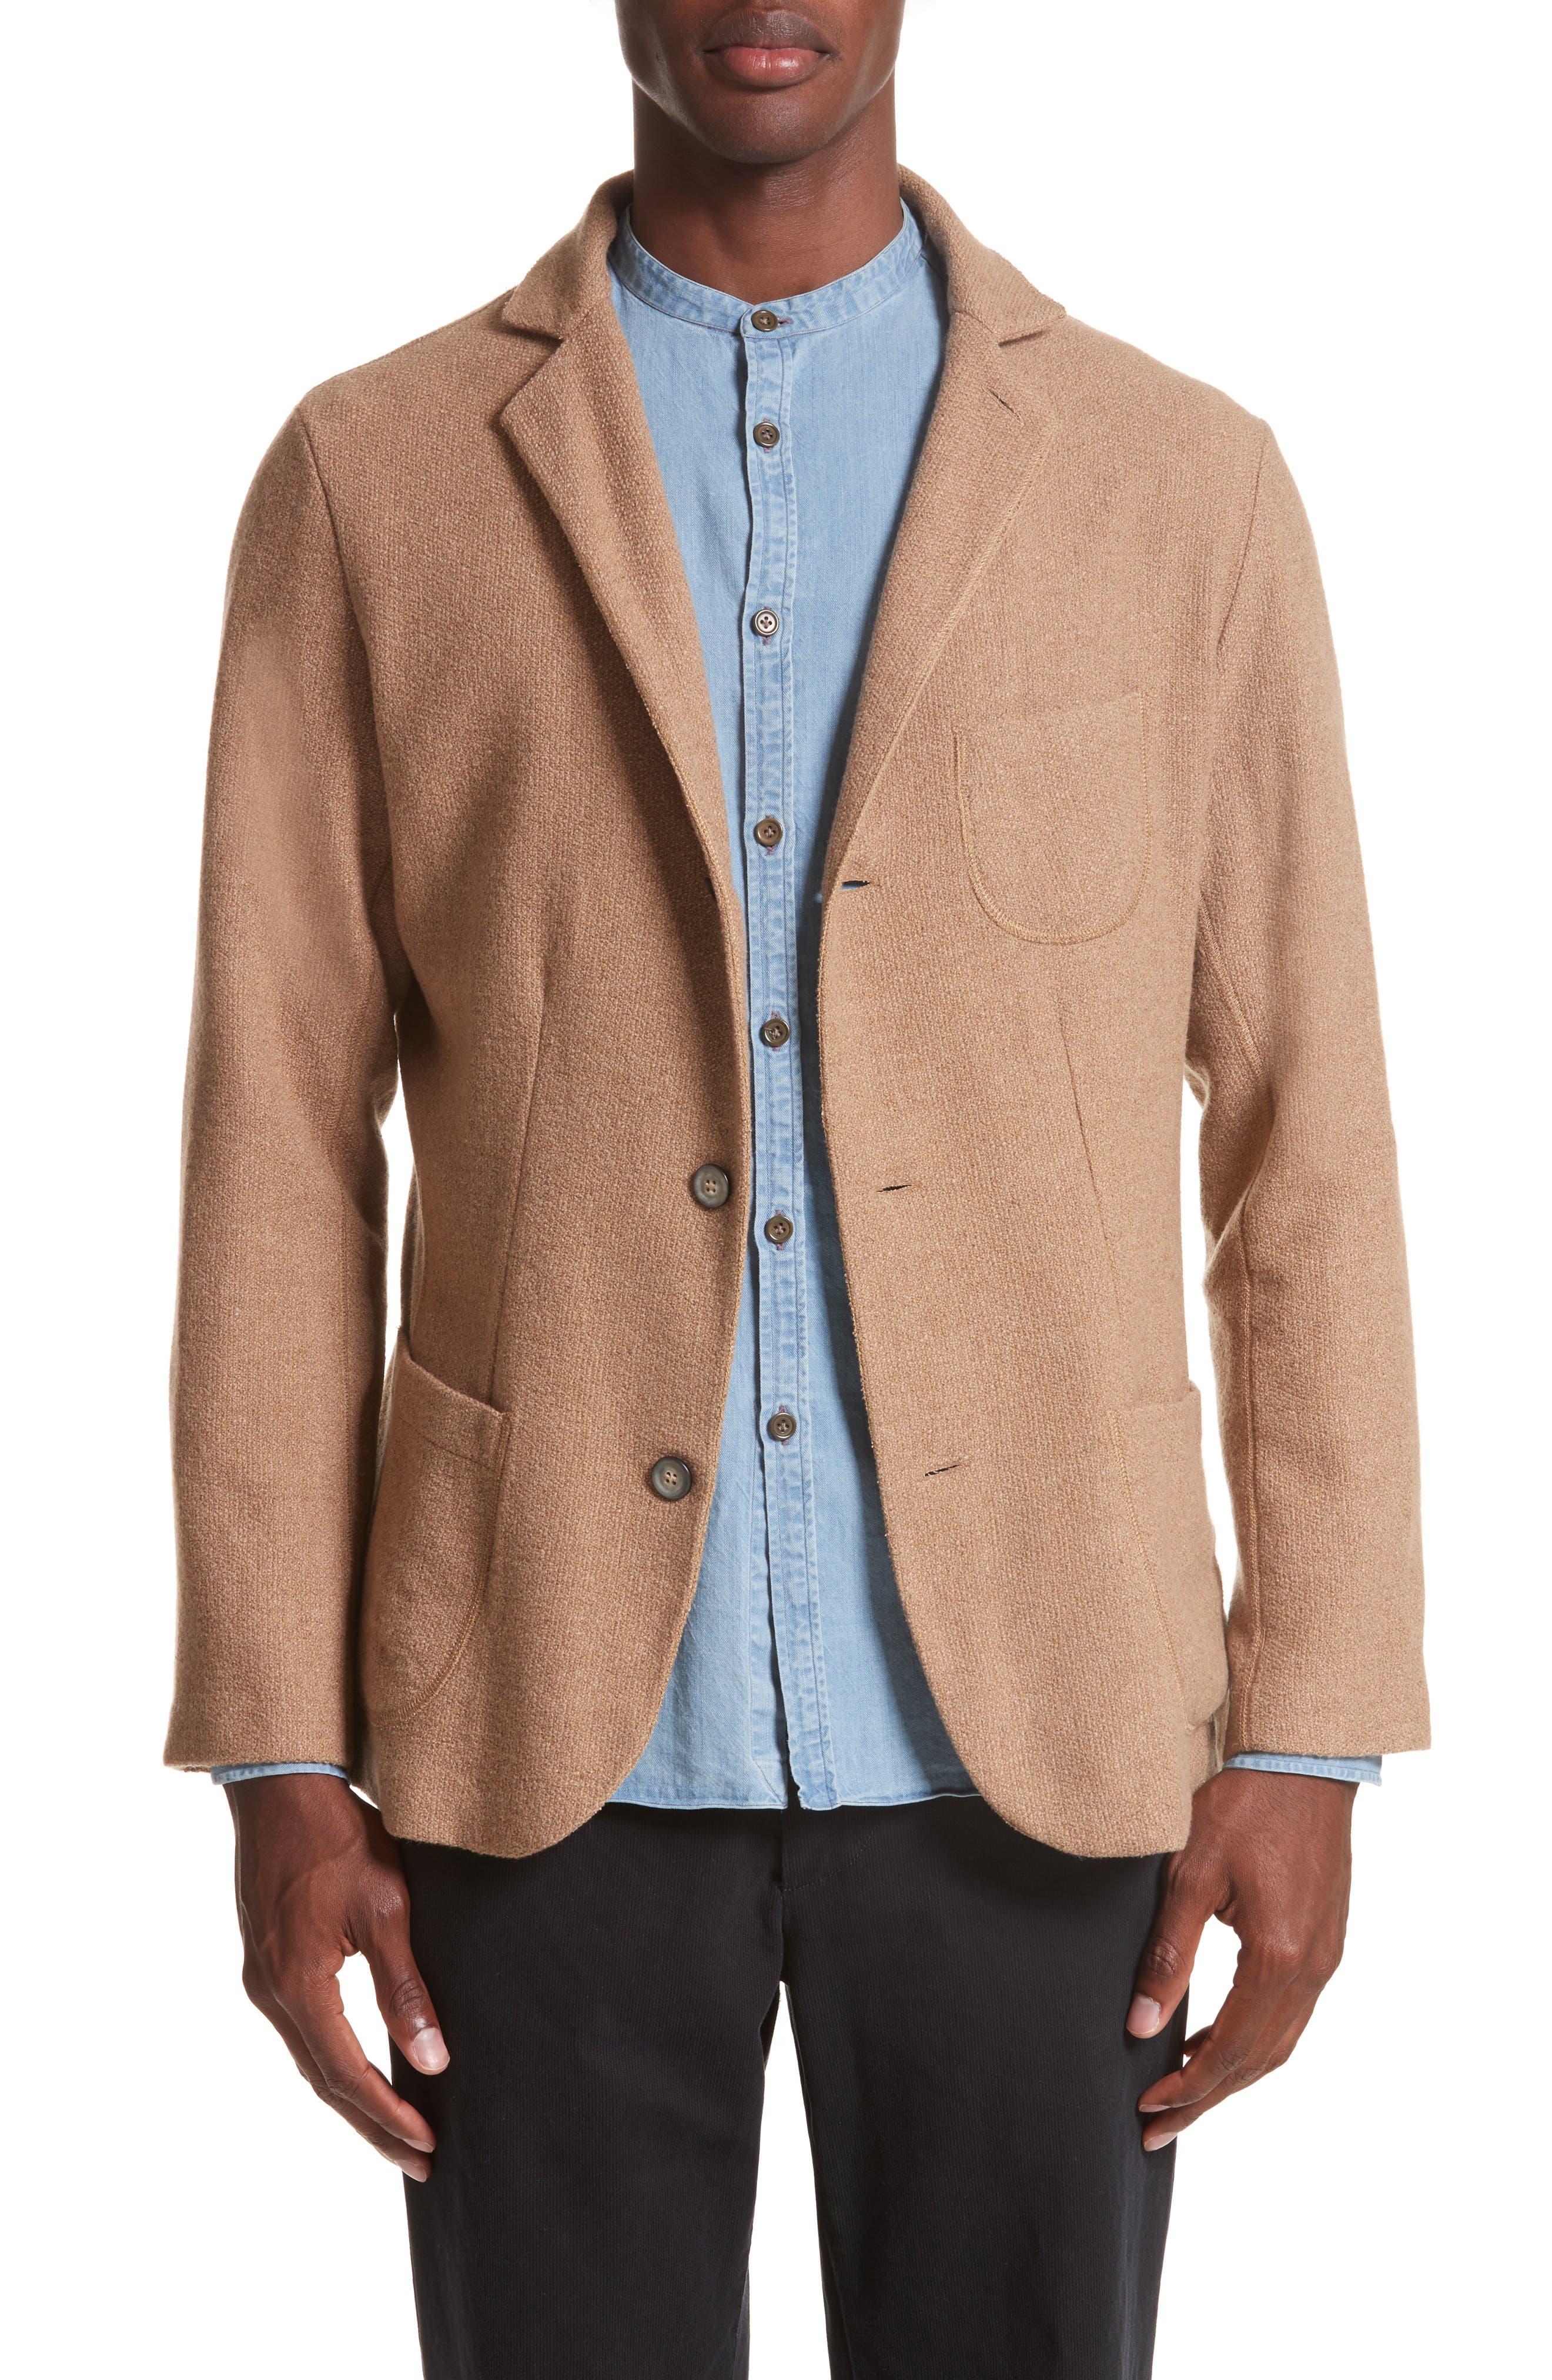 Napoli Nicola Camel Knit Wool Blazer,                         Main,                         color, 465